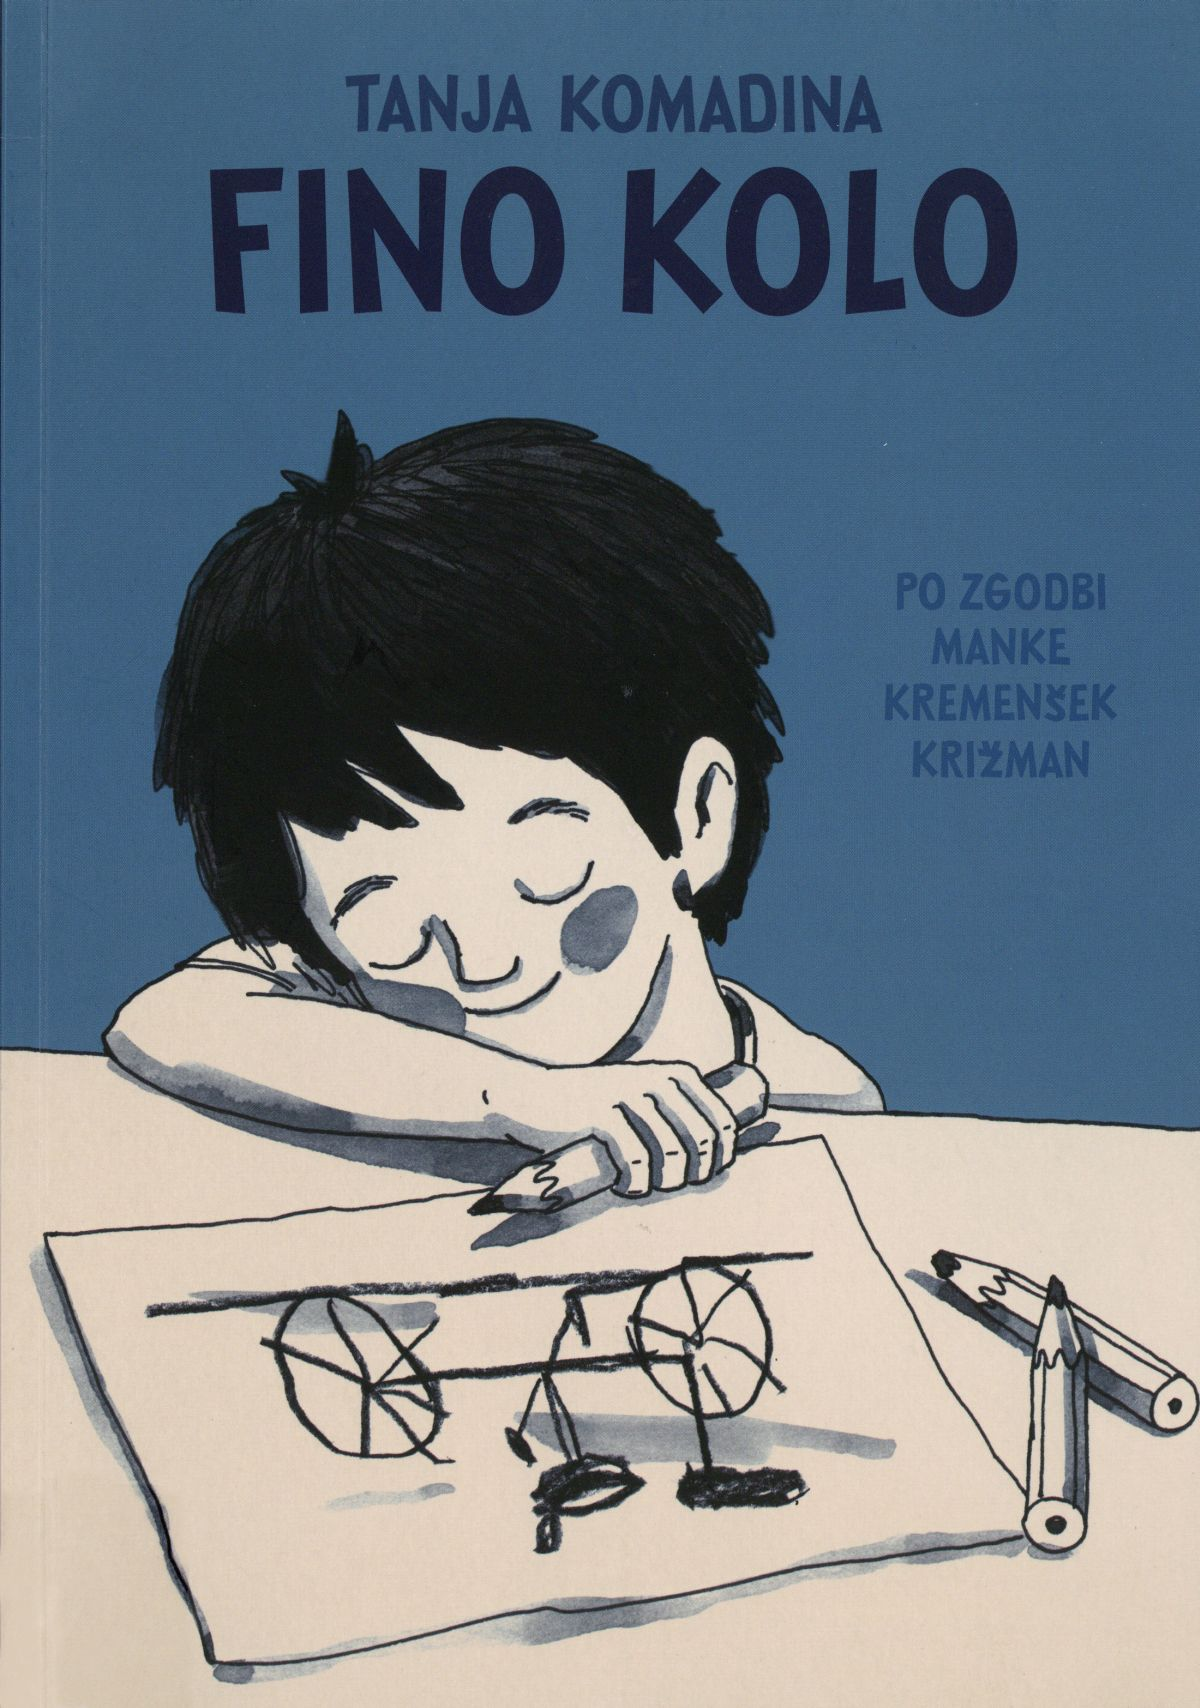 Fino kolo. Po zgodbi Manke Kremenšek Križman (Das schöne Fahrrad. Nach einer Geschichte von Manka Kremenšek Križman) Book Cover